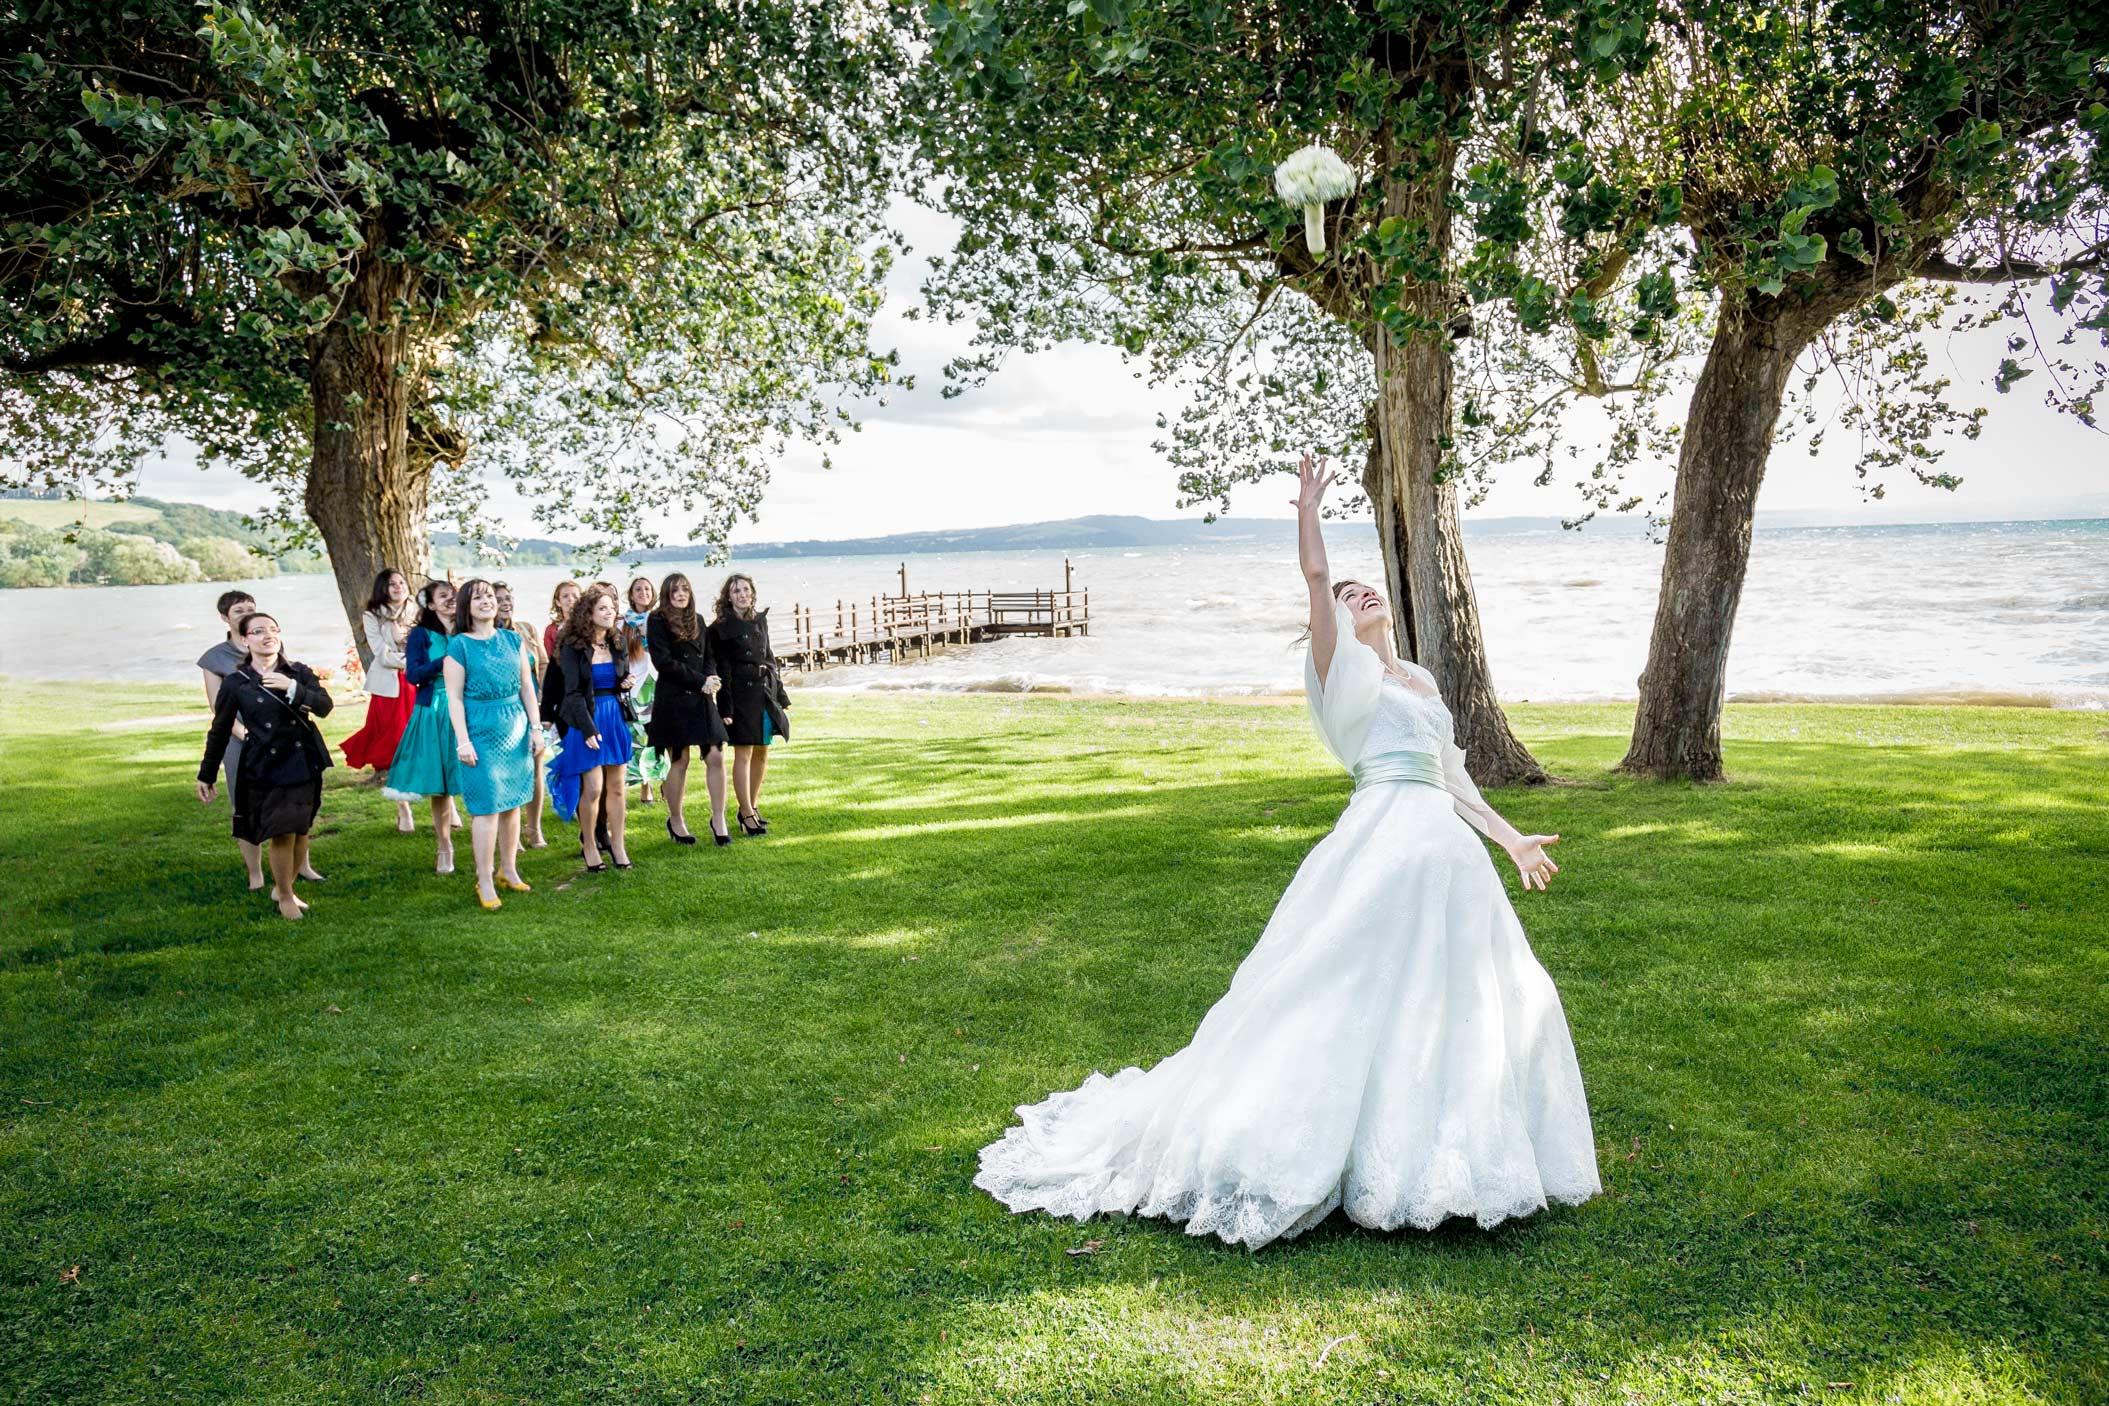 Fotografo-Matrimonio-Reportage-Ricevimento